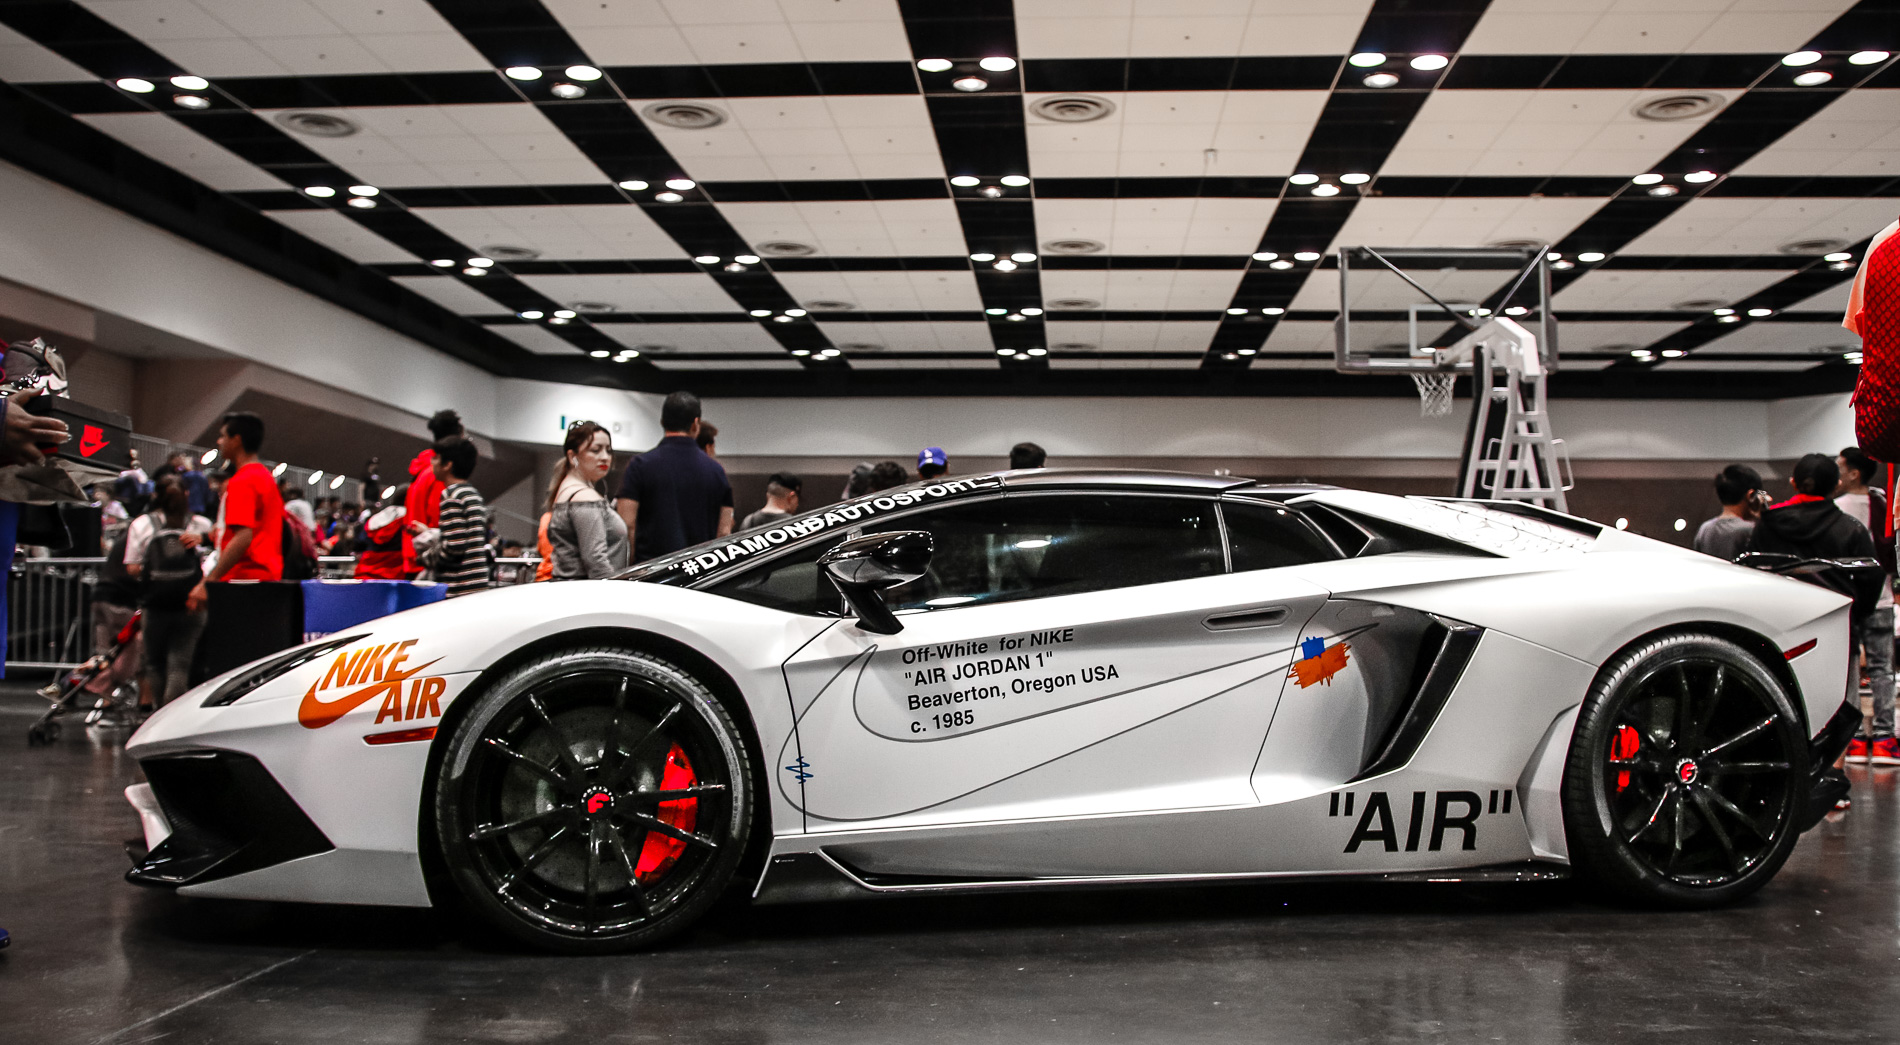 Off White Lamborghini Aventador Diamond Autosport